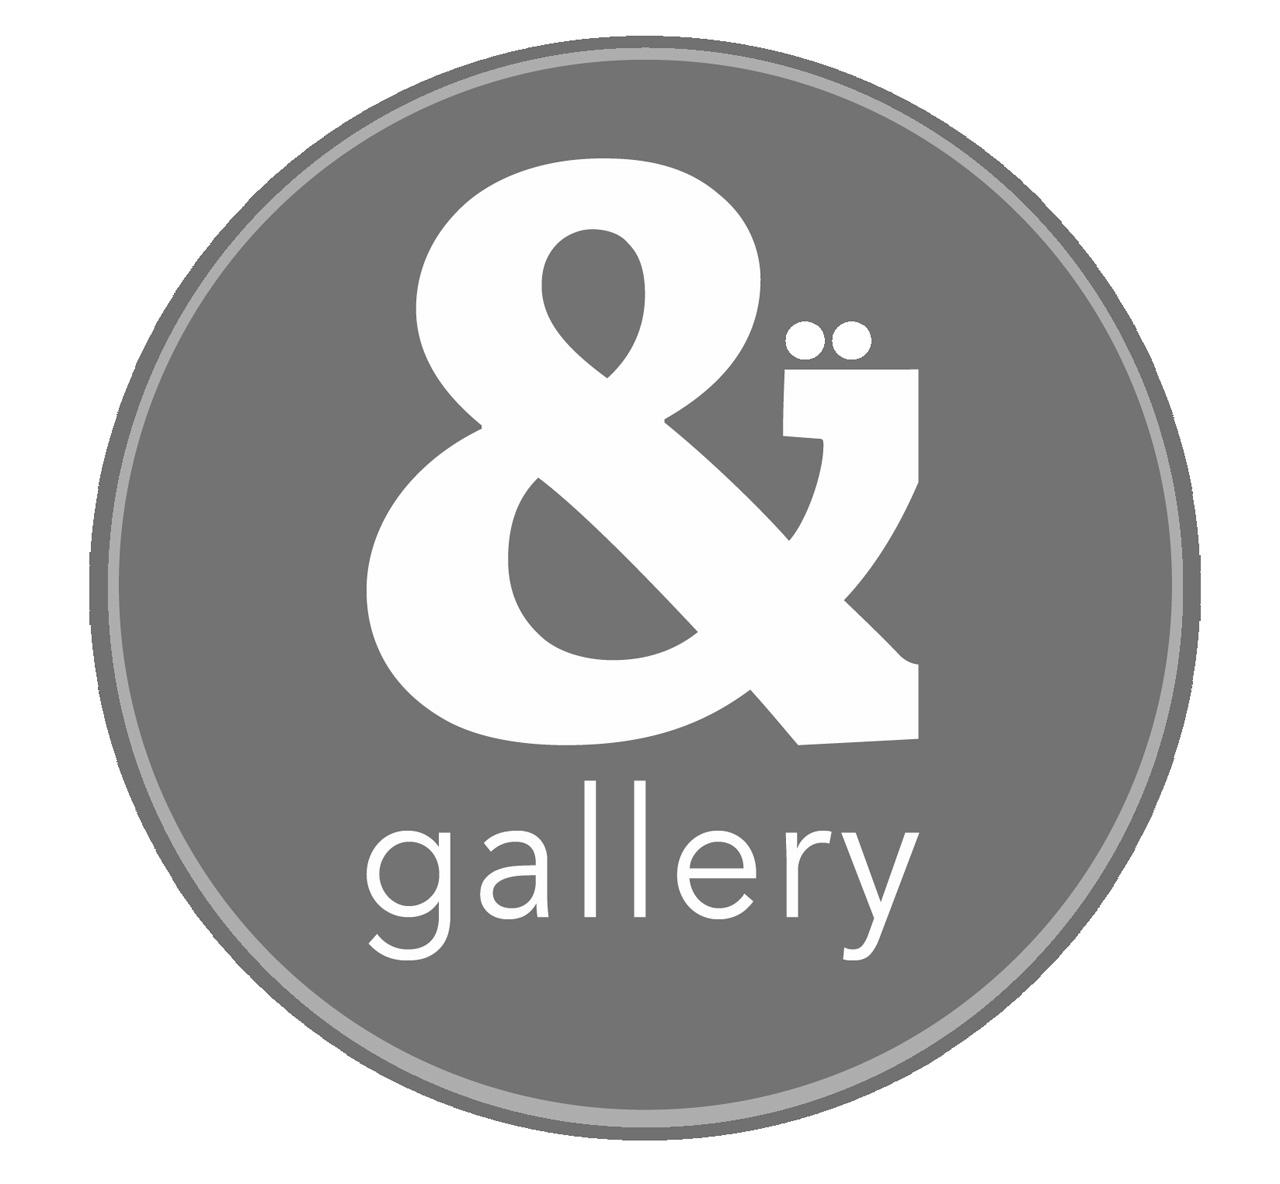 &Gallery